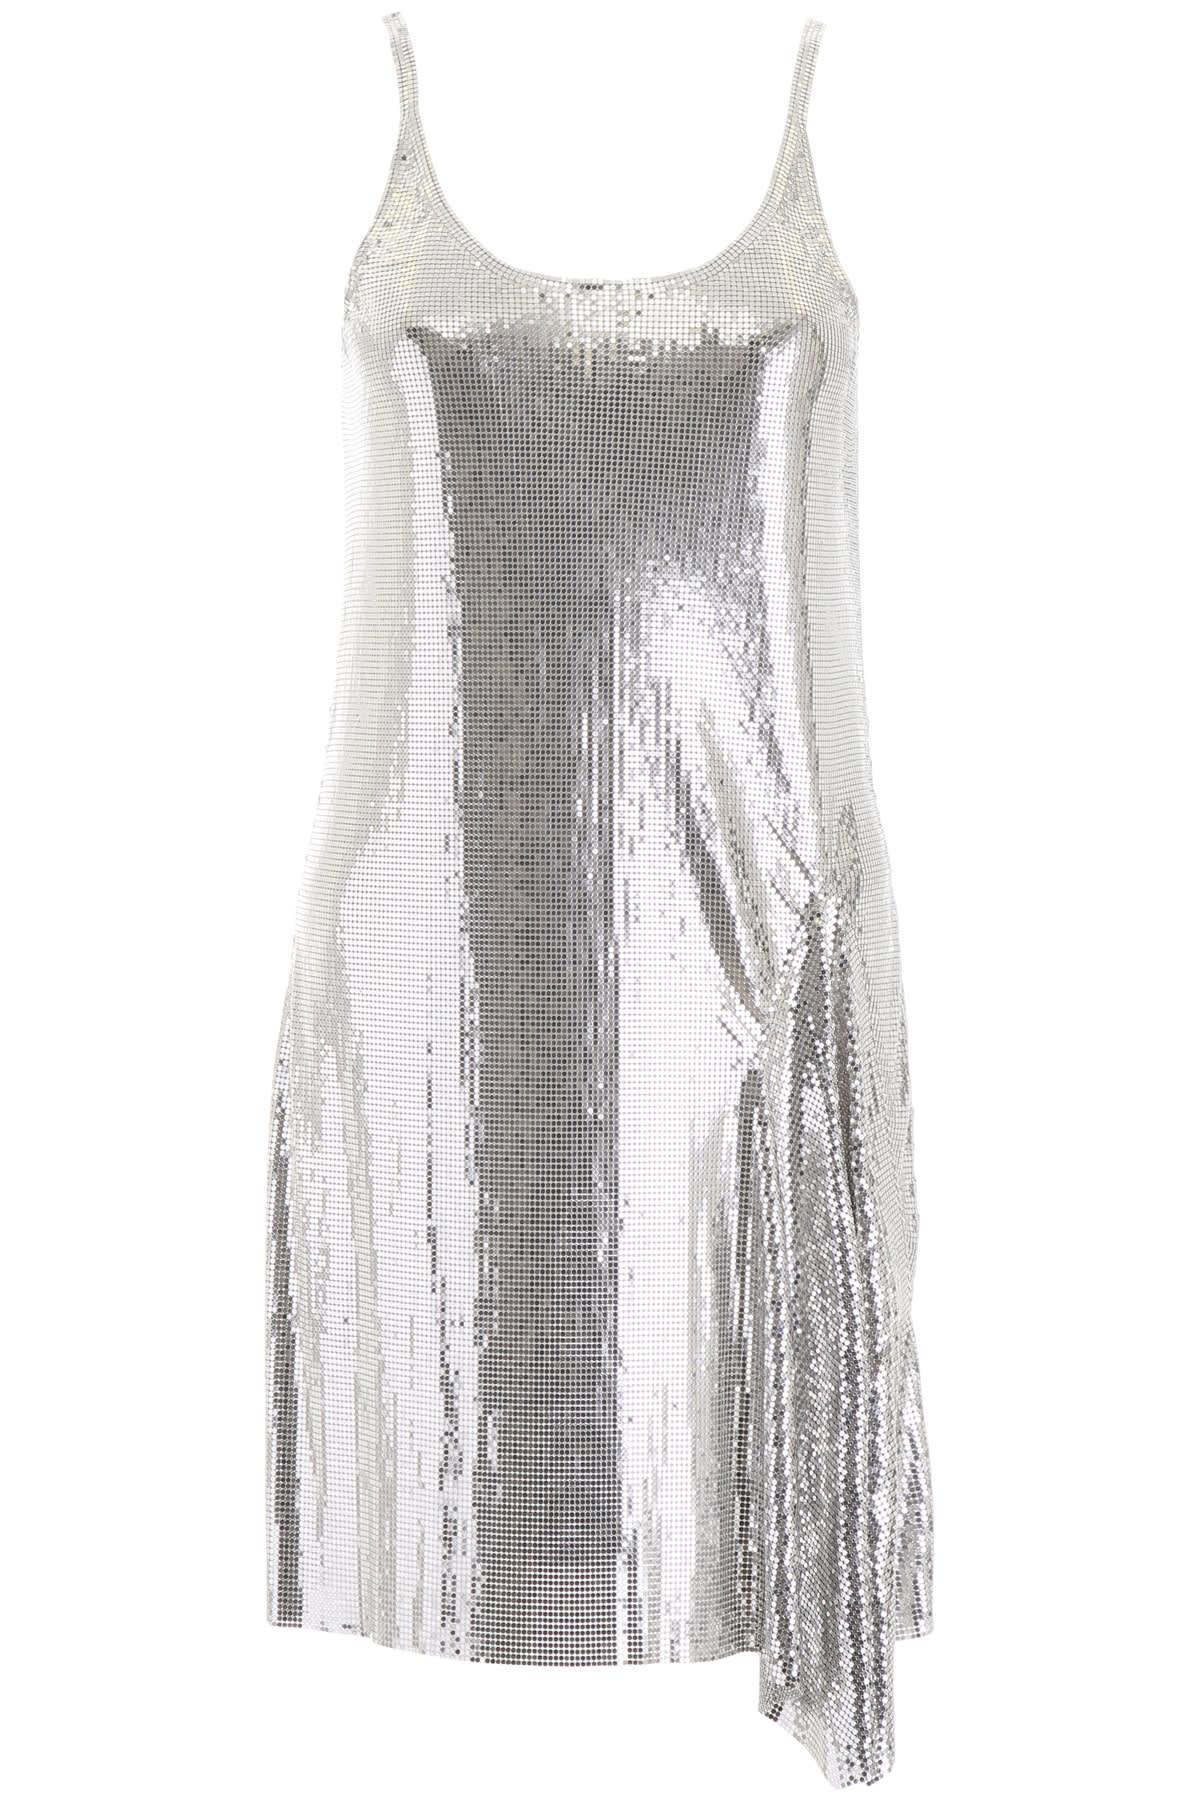 Paco Rabanne Metallic Mini Dress